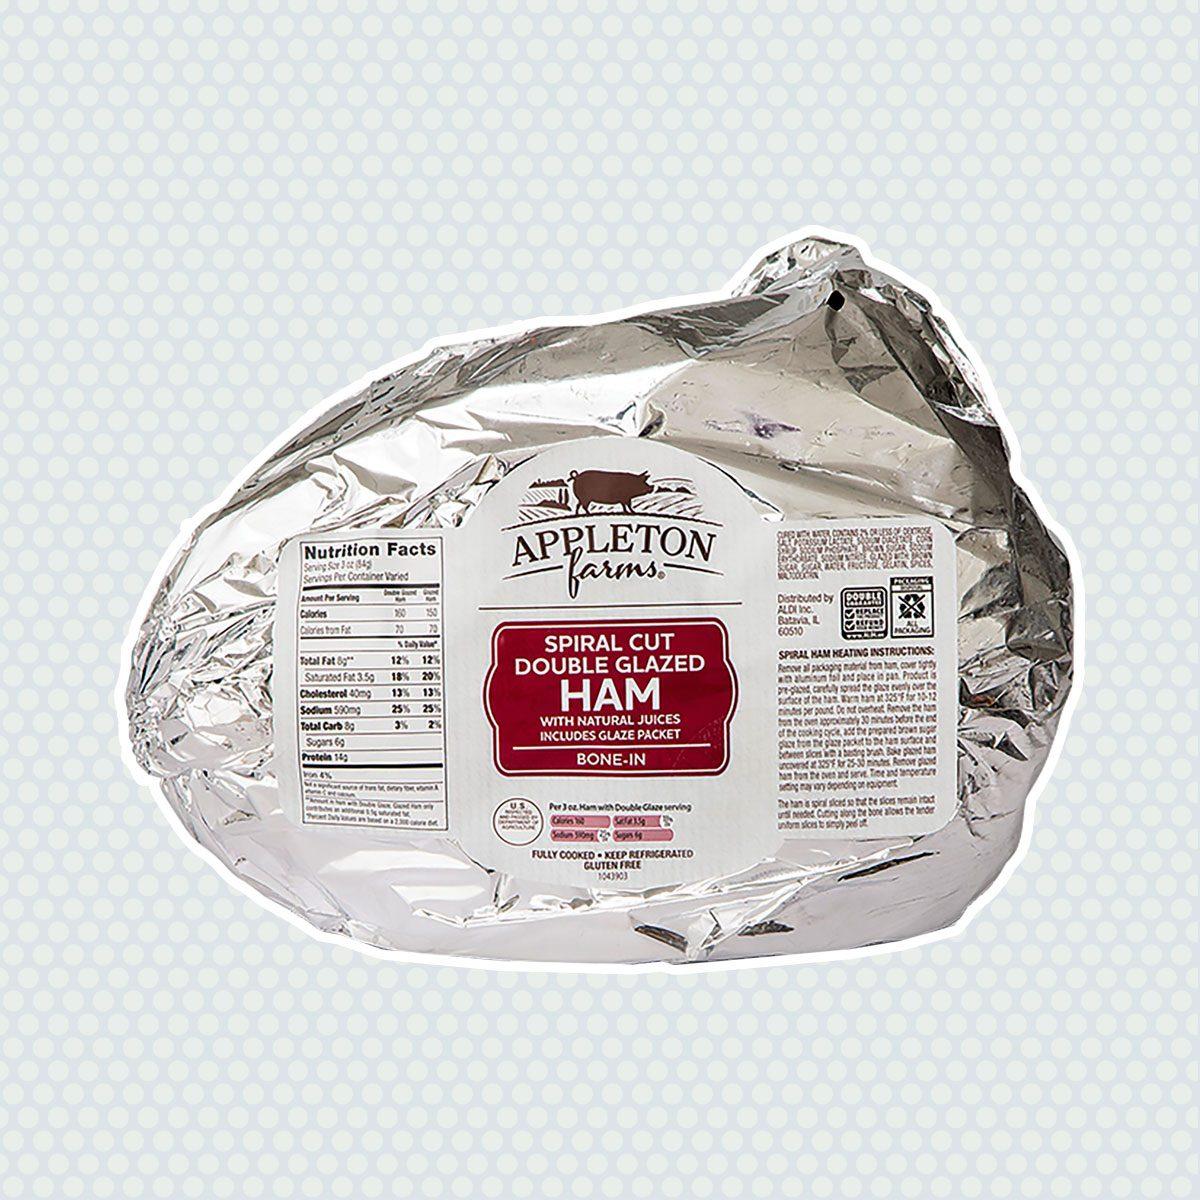 Appleton Farms Spiral Sliced Double Glazed Brown Sugar Ham